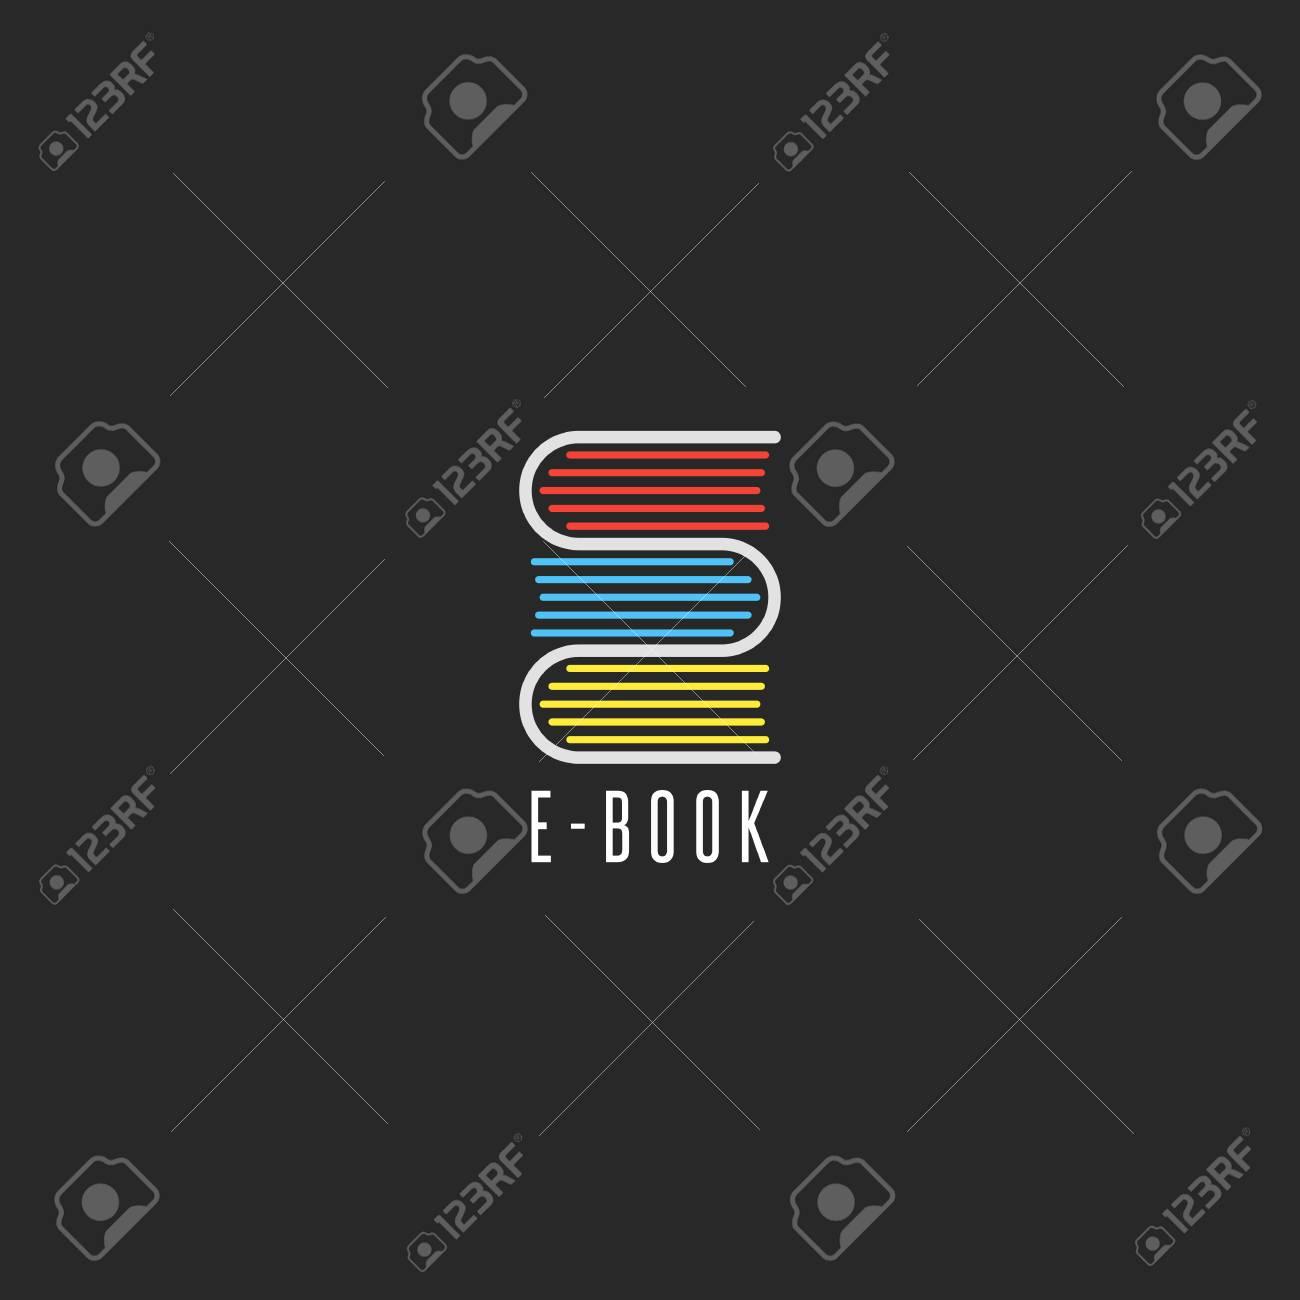 E-book bookstore logo, online school education emblem mockup,